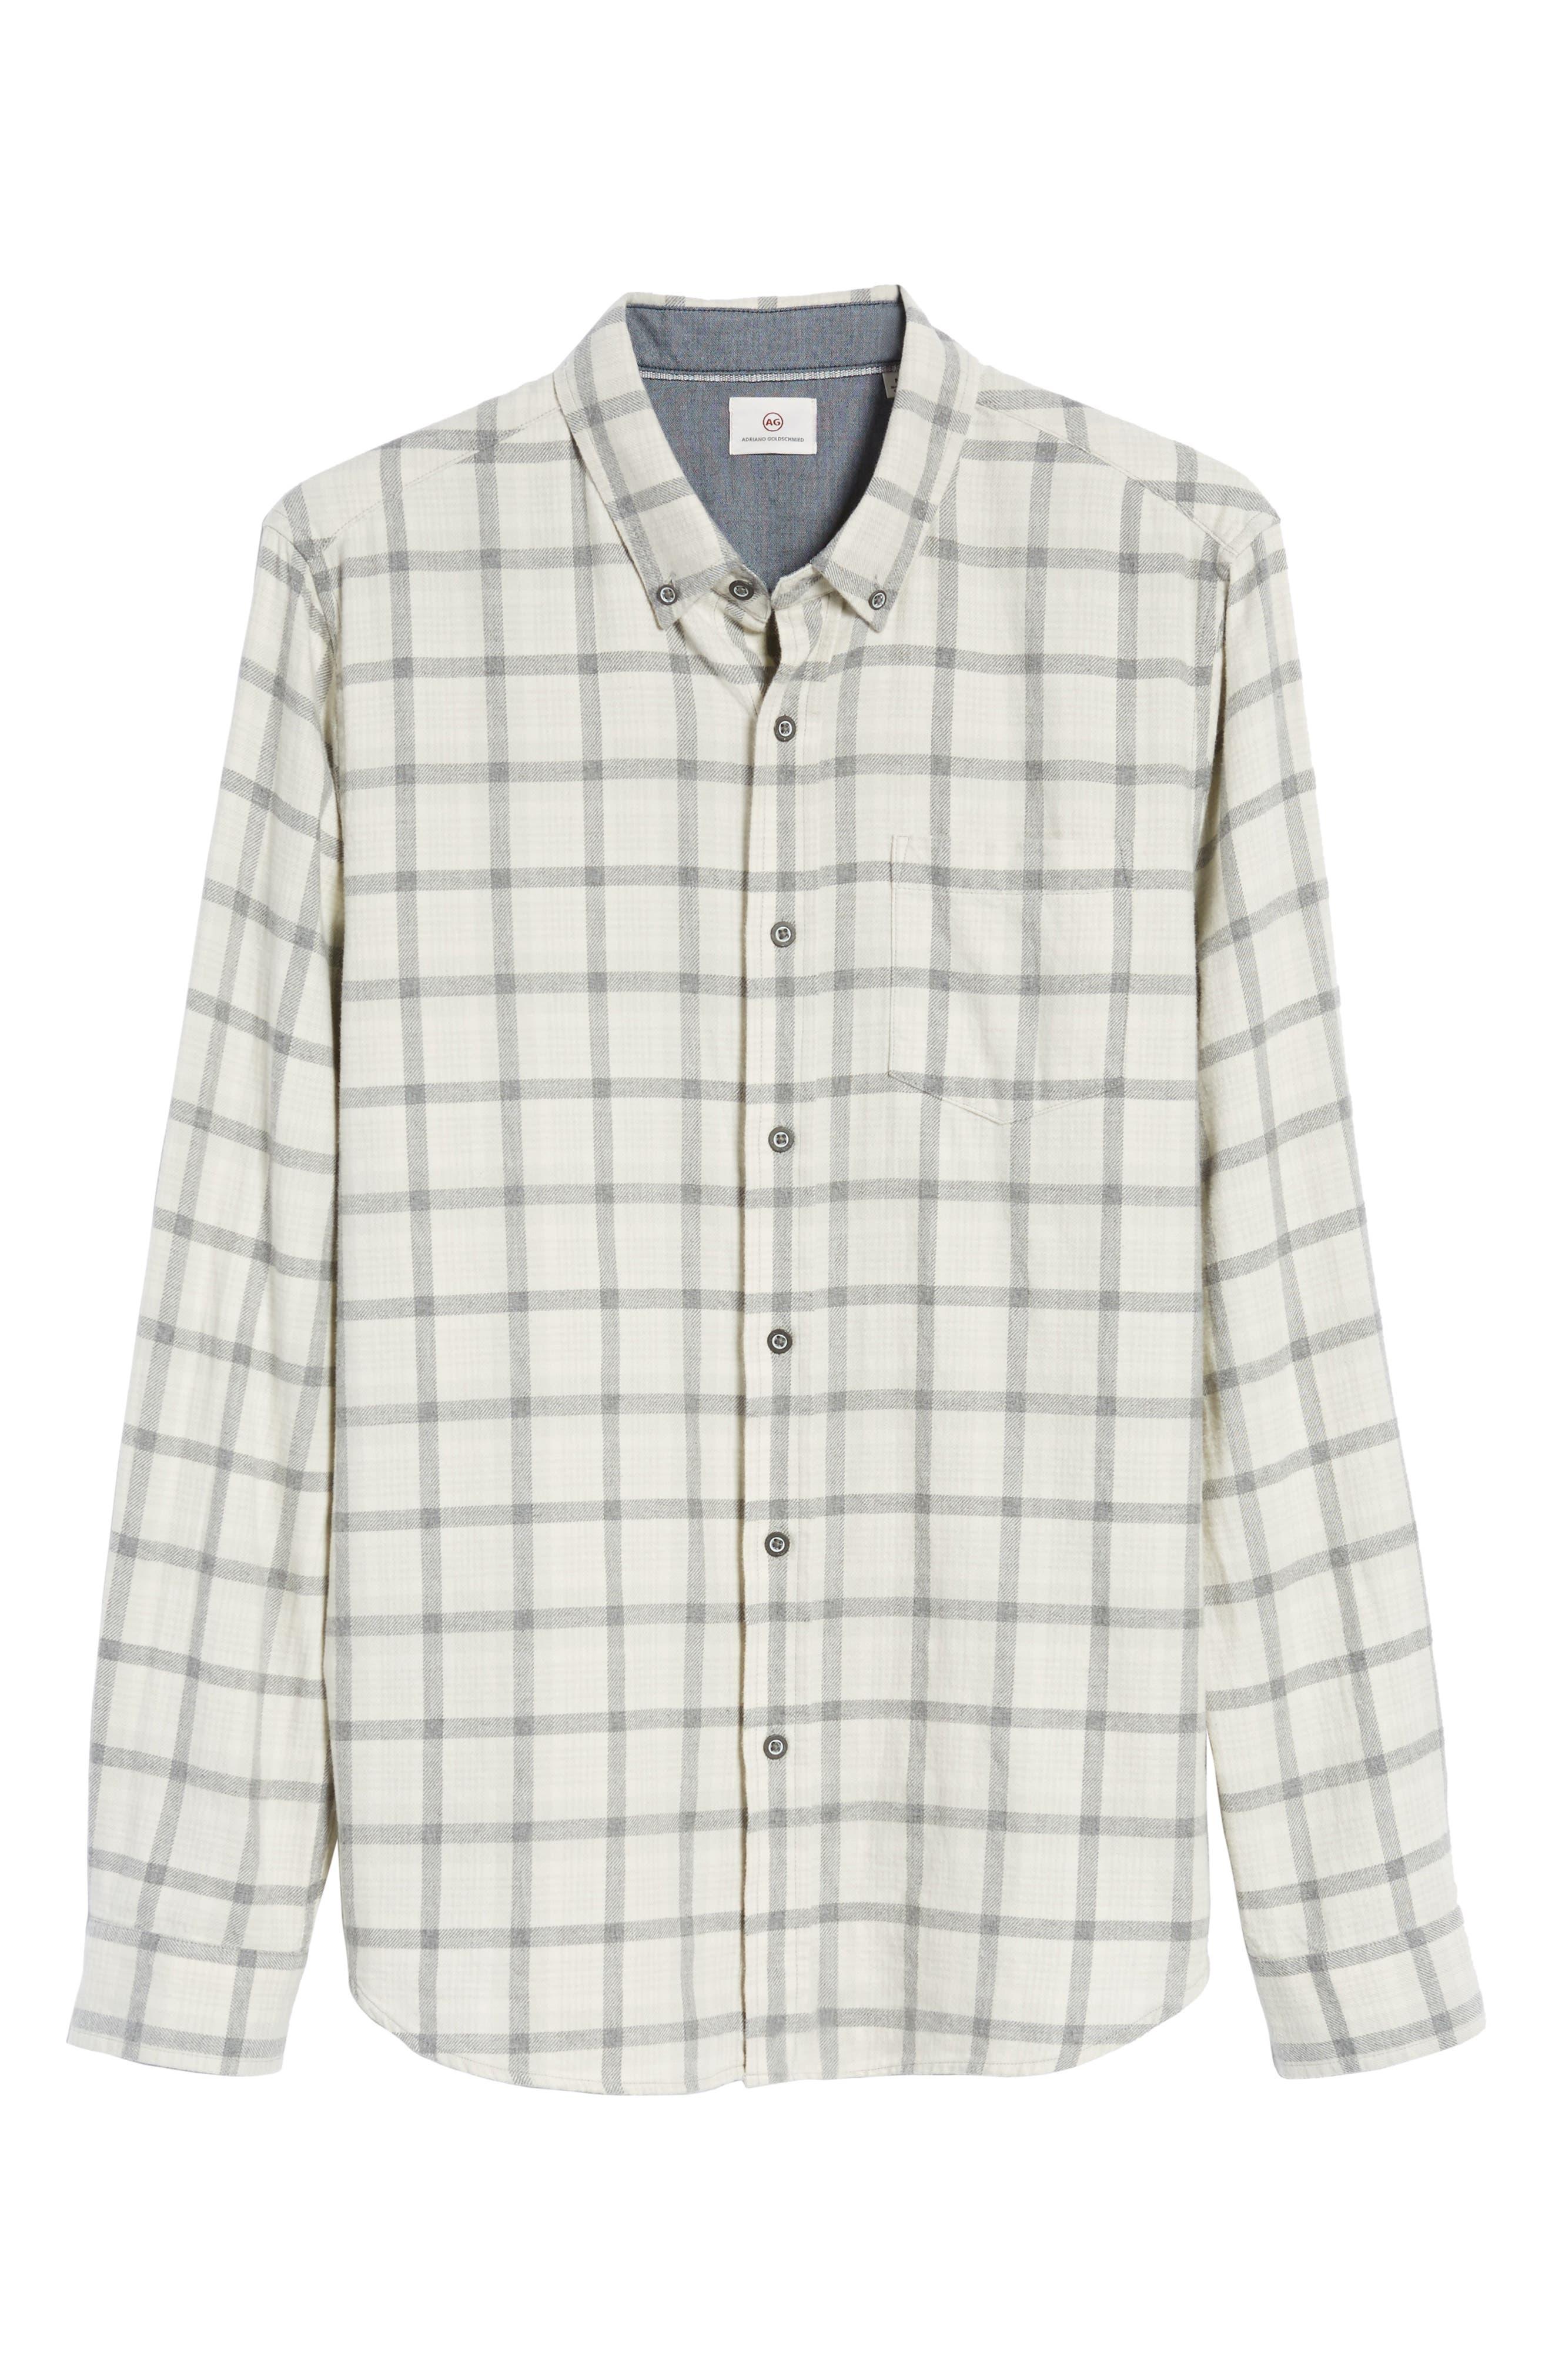 Grady Slim Fit Plaid Sport Shirt,                             Alternate thumbnail 6, color,                             Moon Glade/ Heather Grey